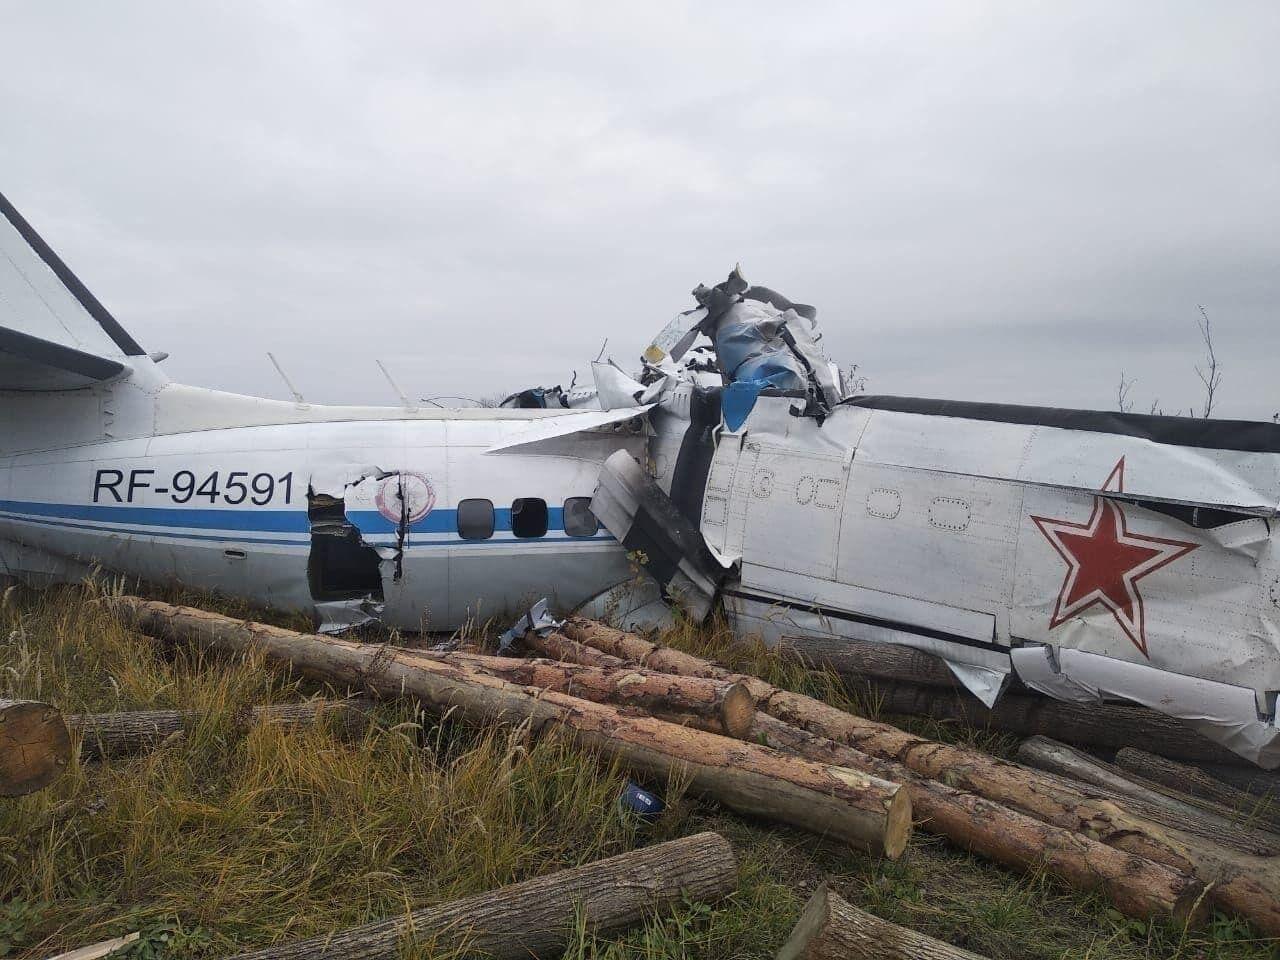 Фюзеляж L-410 зруйнувався